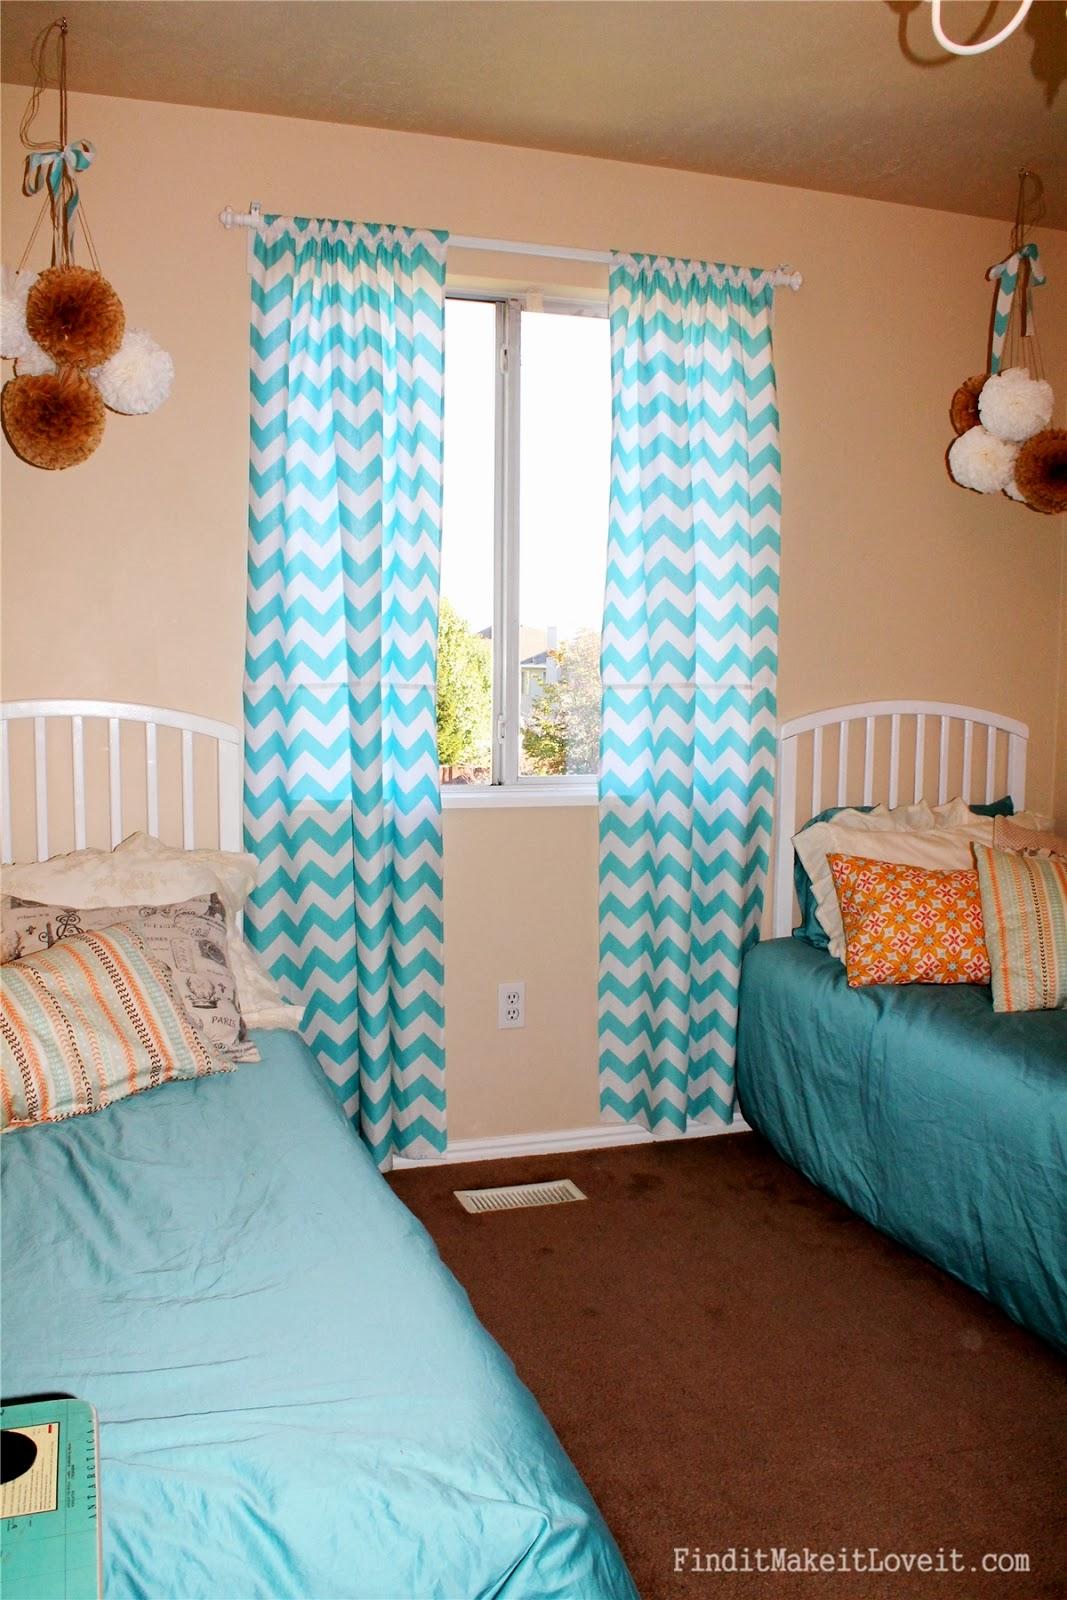 Aqua chevron shower curtain - Wilko Aqua Chevron Shower Curtain Curtains Make Such A Difference They Have Really Brightened The Girls Room And Added Some